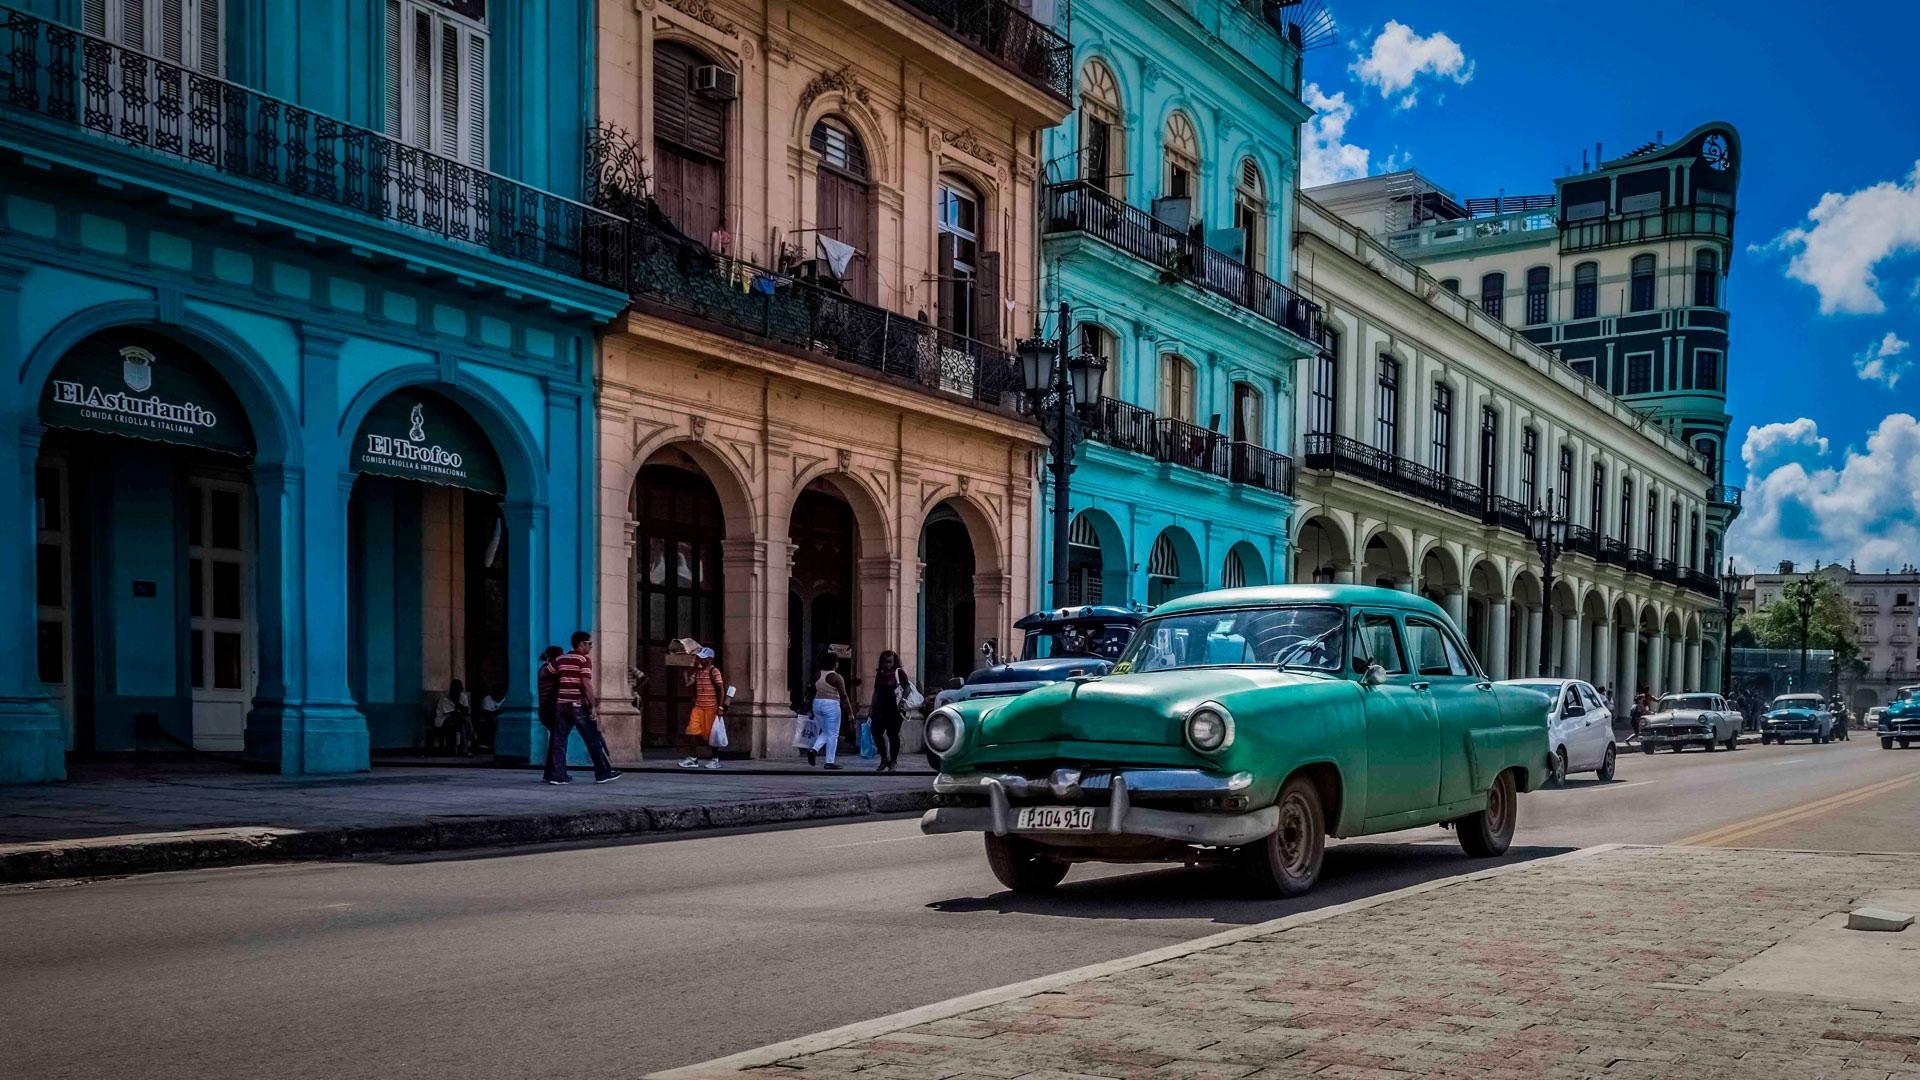 https://www.centraldevacaciones.pt/viajes/assets/upload/d4187.jpg